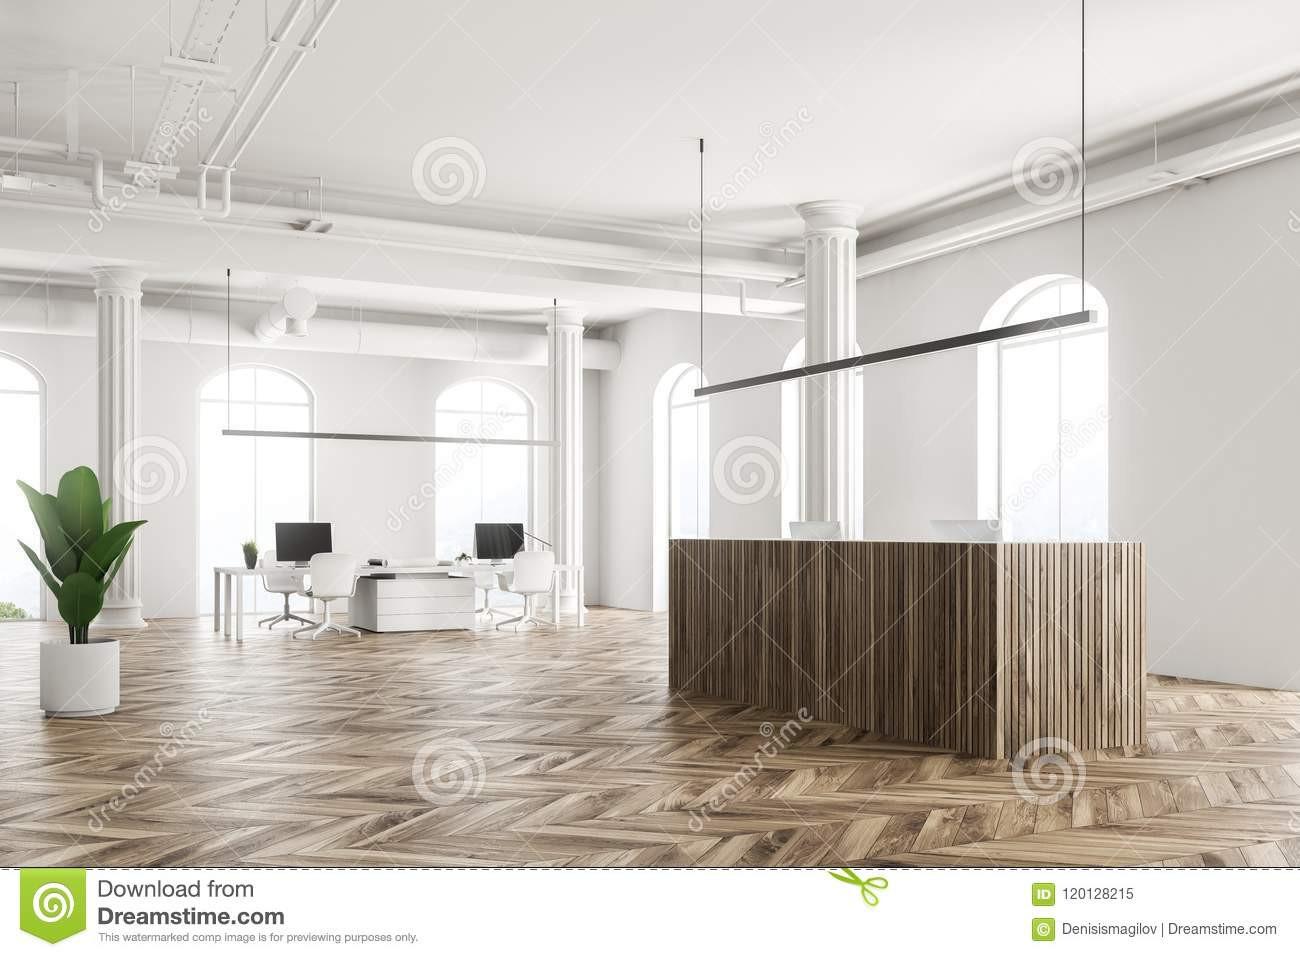 12 Fantastic Using Hardwood Flooring On Walls 2021 free download using hardwood flooring on walls of white office corner wooden reception stock image image of in white office corner wooden reception